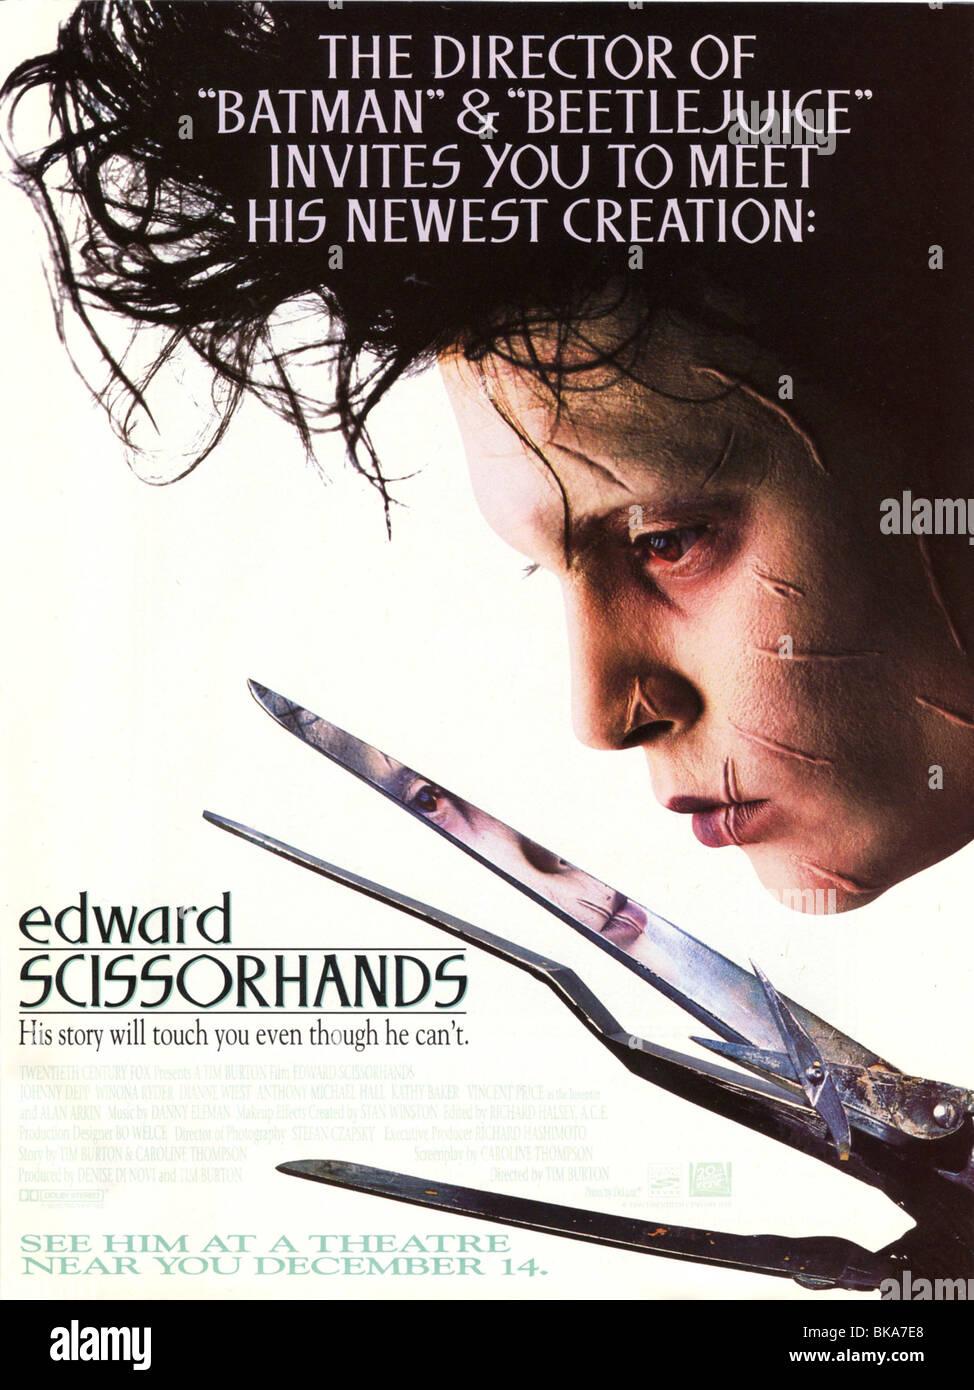 Edward Scissorhands Year : 1990 Director : Tim Burton Johnny Depp Movie poster (USA) - Stock Image